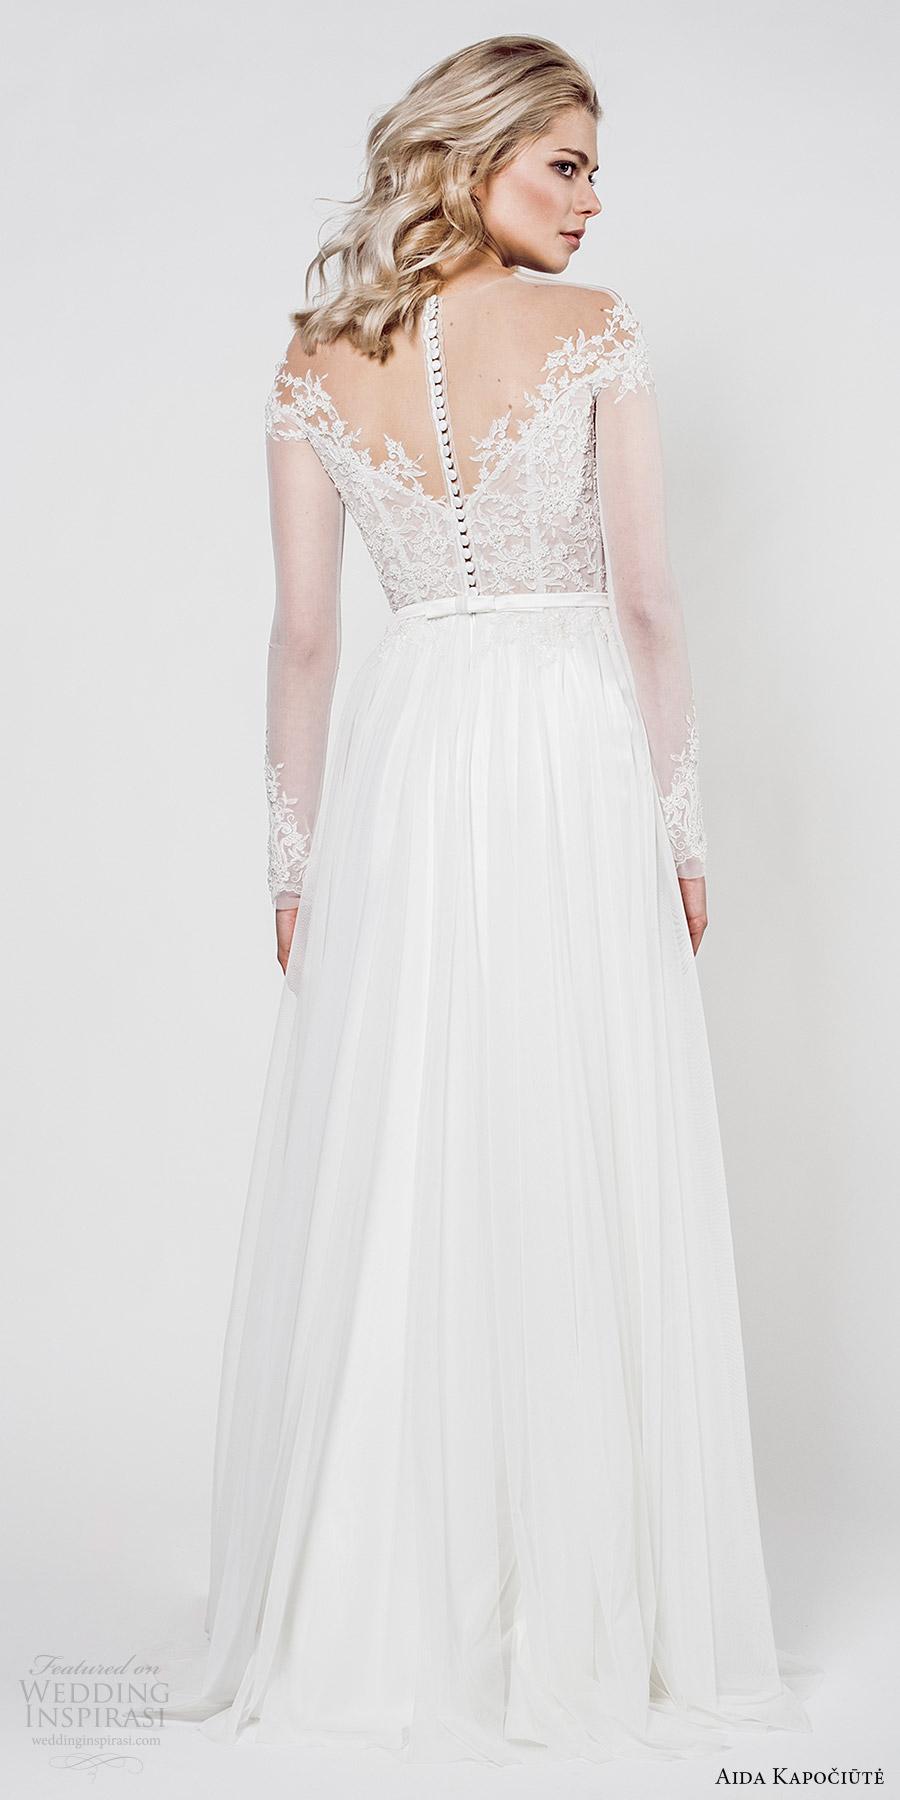 aida kapociute 2017 bridal illusion long sleeves sheer off shoulder lace bodice a line wedding dress (11) bv romantic